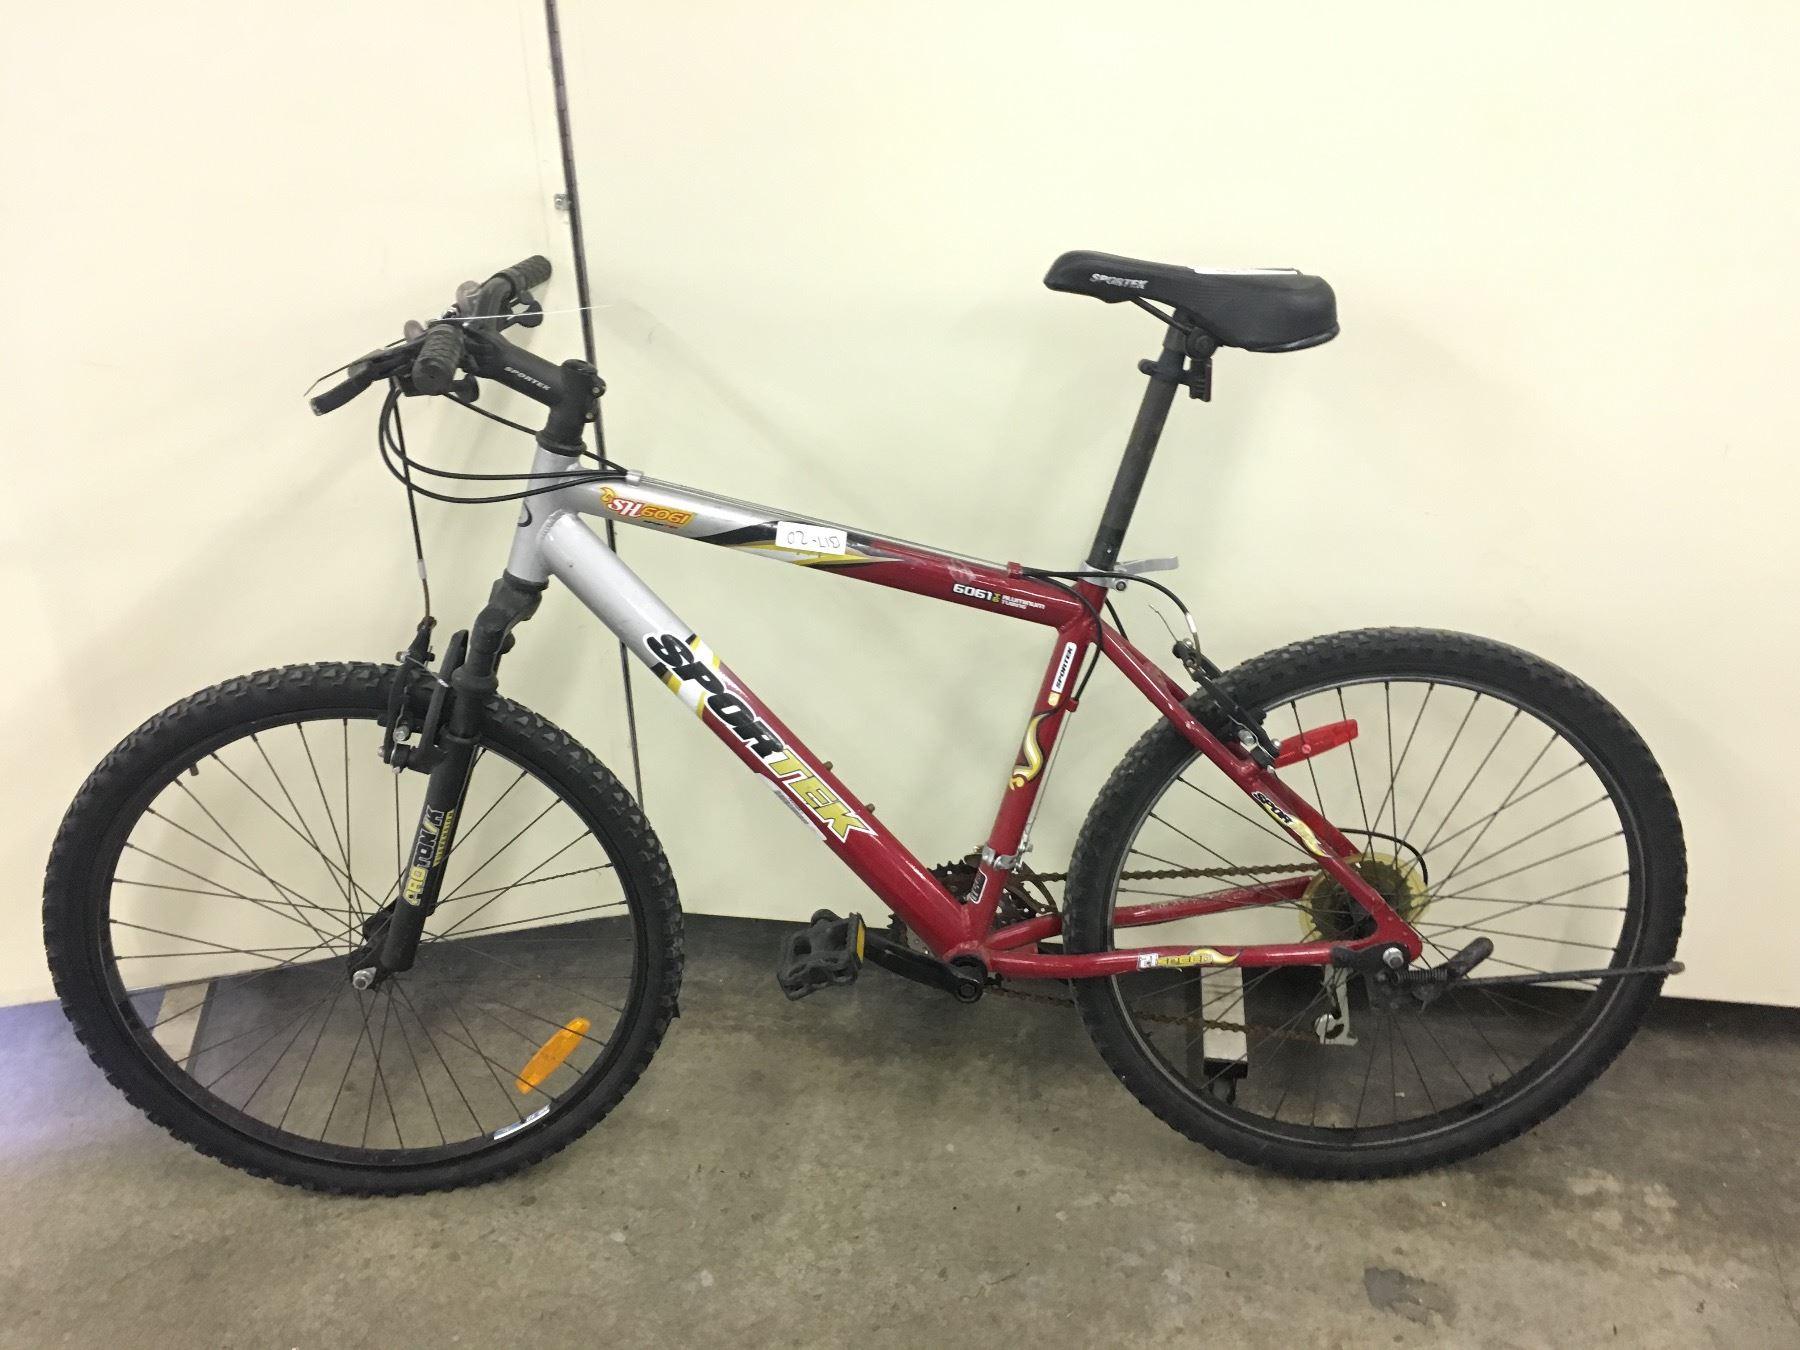 Red And Grey Sportek Sh6061 Front Suspension Mountain Bike Able Auctions Kung nag hahanap kayo ng mtb na nasa ganitong price point for commuting or casual rides, this. able auctions